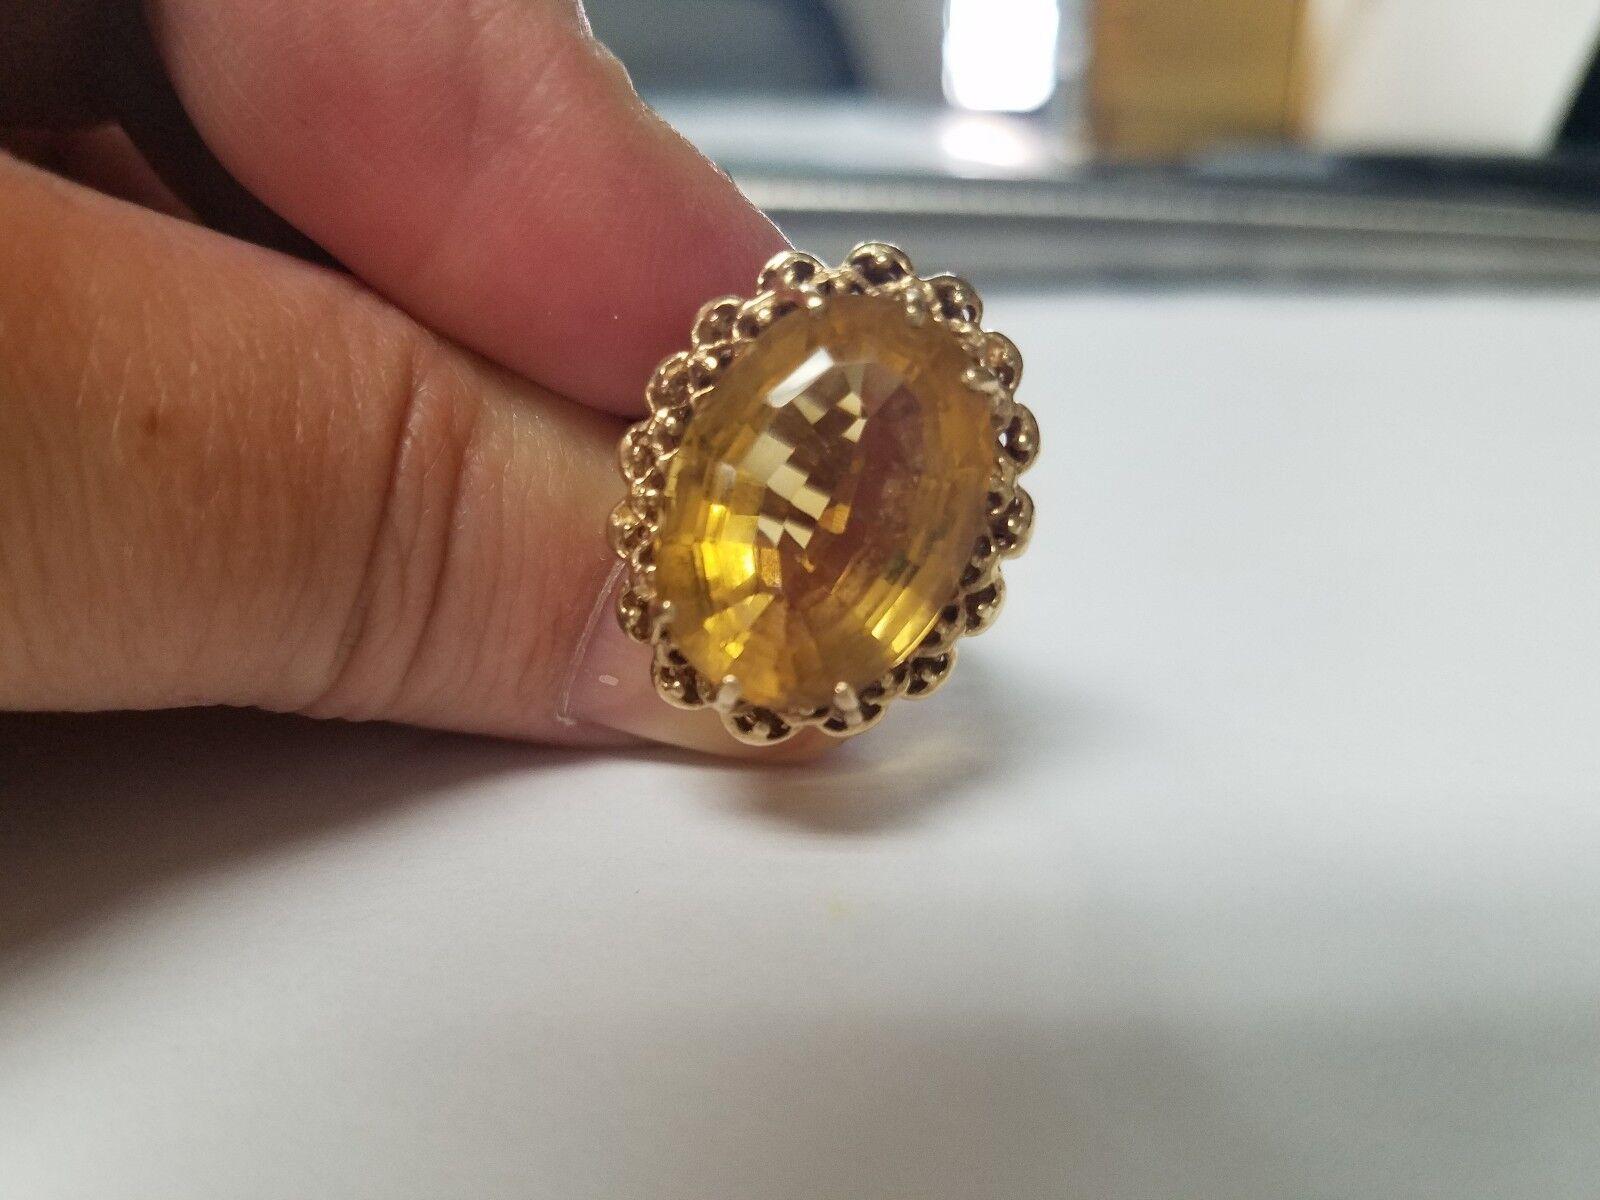 8b377582c4403 14.20ct European Antique Citrine Ring gold Yellow 10k xqwt492121380 ...